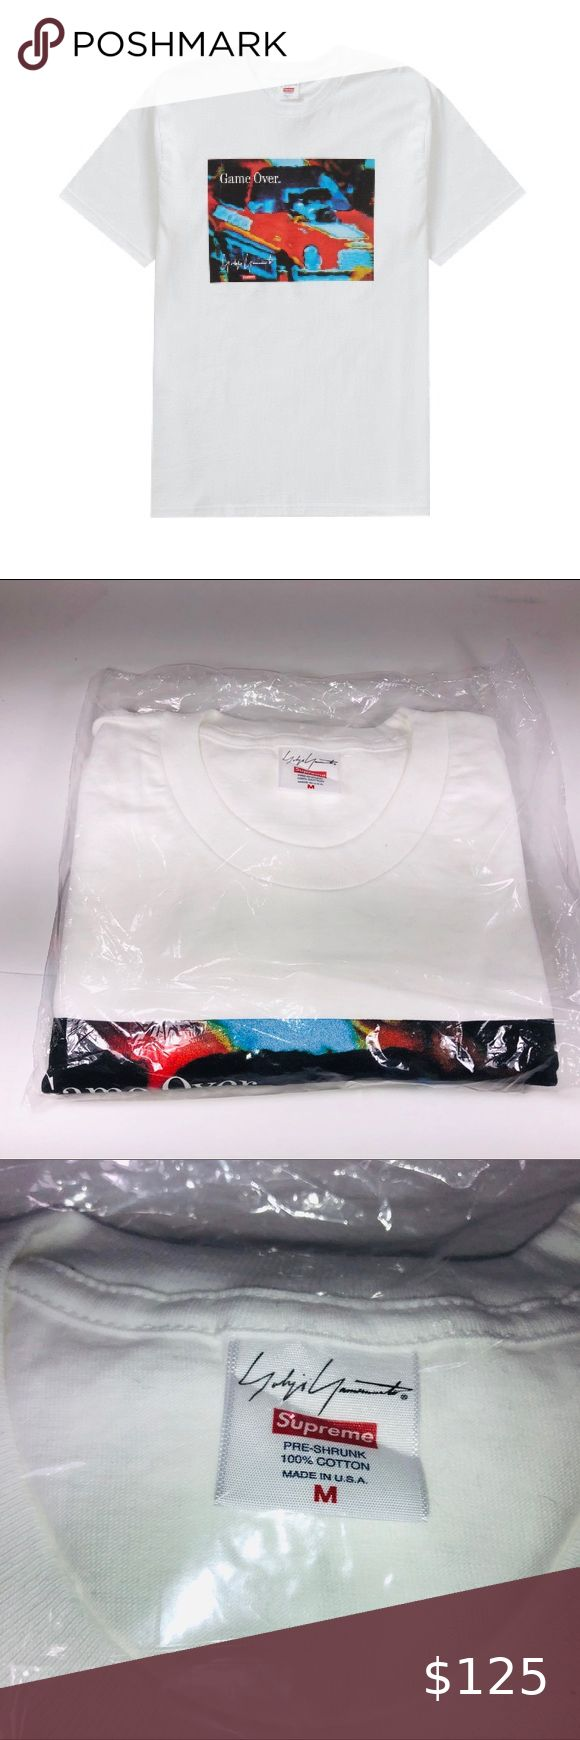 Supreme Yohji Yamamoto Game Over White Tee Shirt White Tee Shirts Chart Tee Tee Shirts